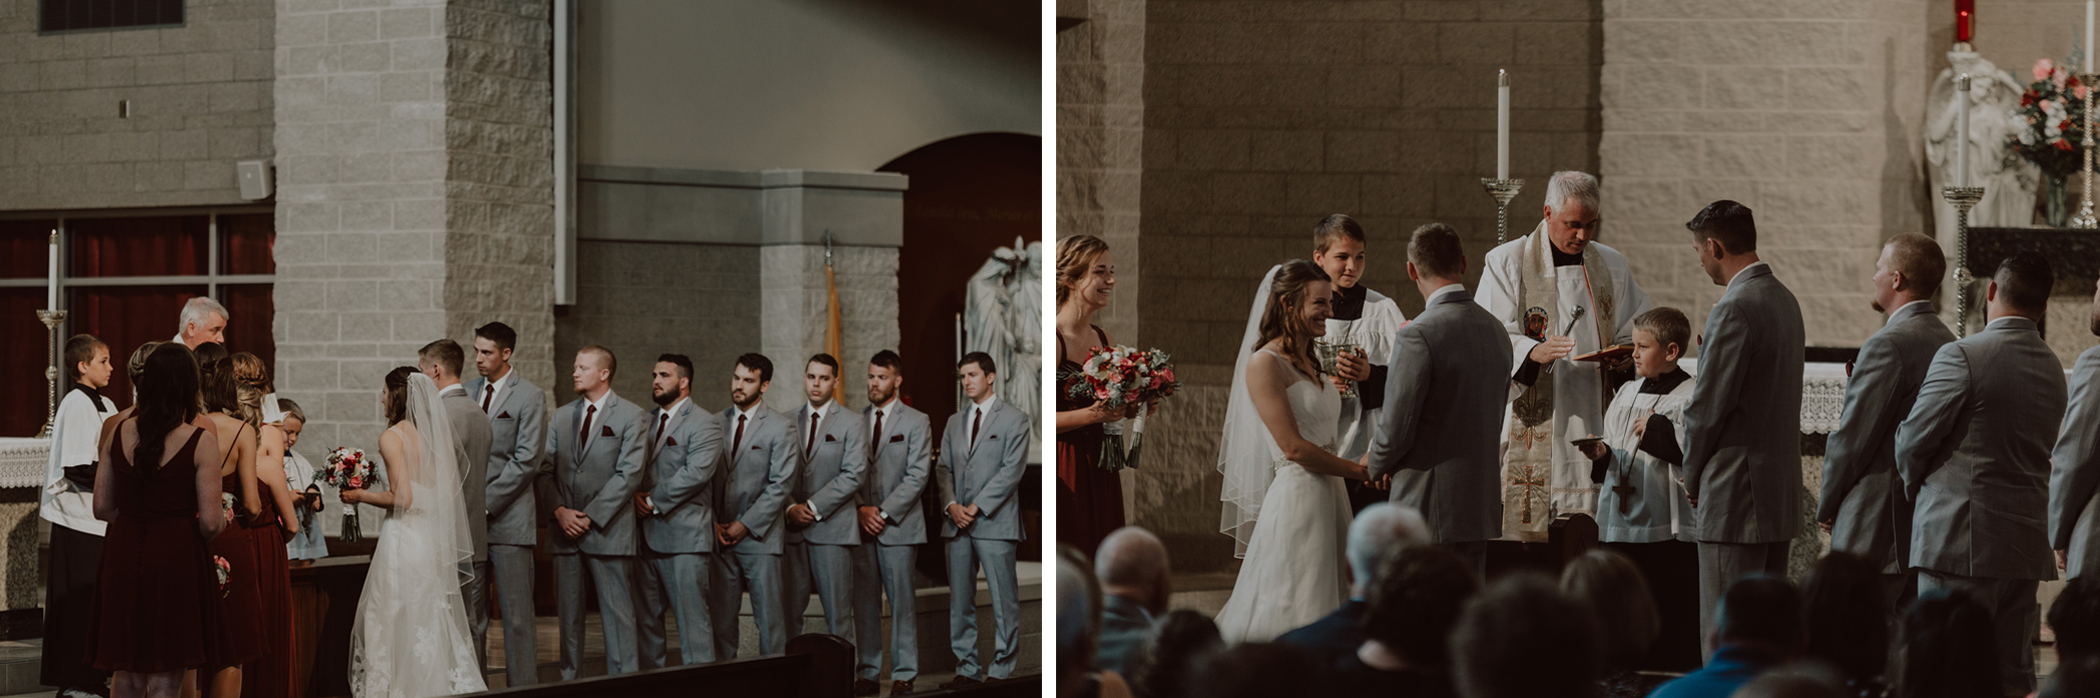 side-by-side-horizontal6.jpg